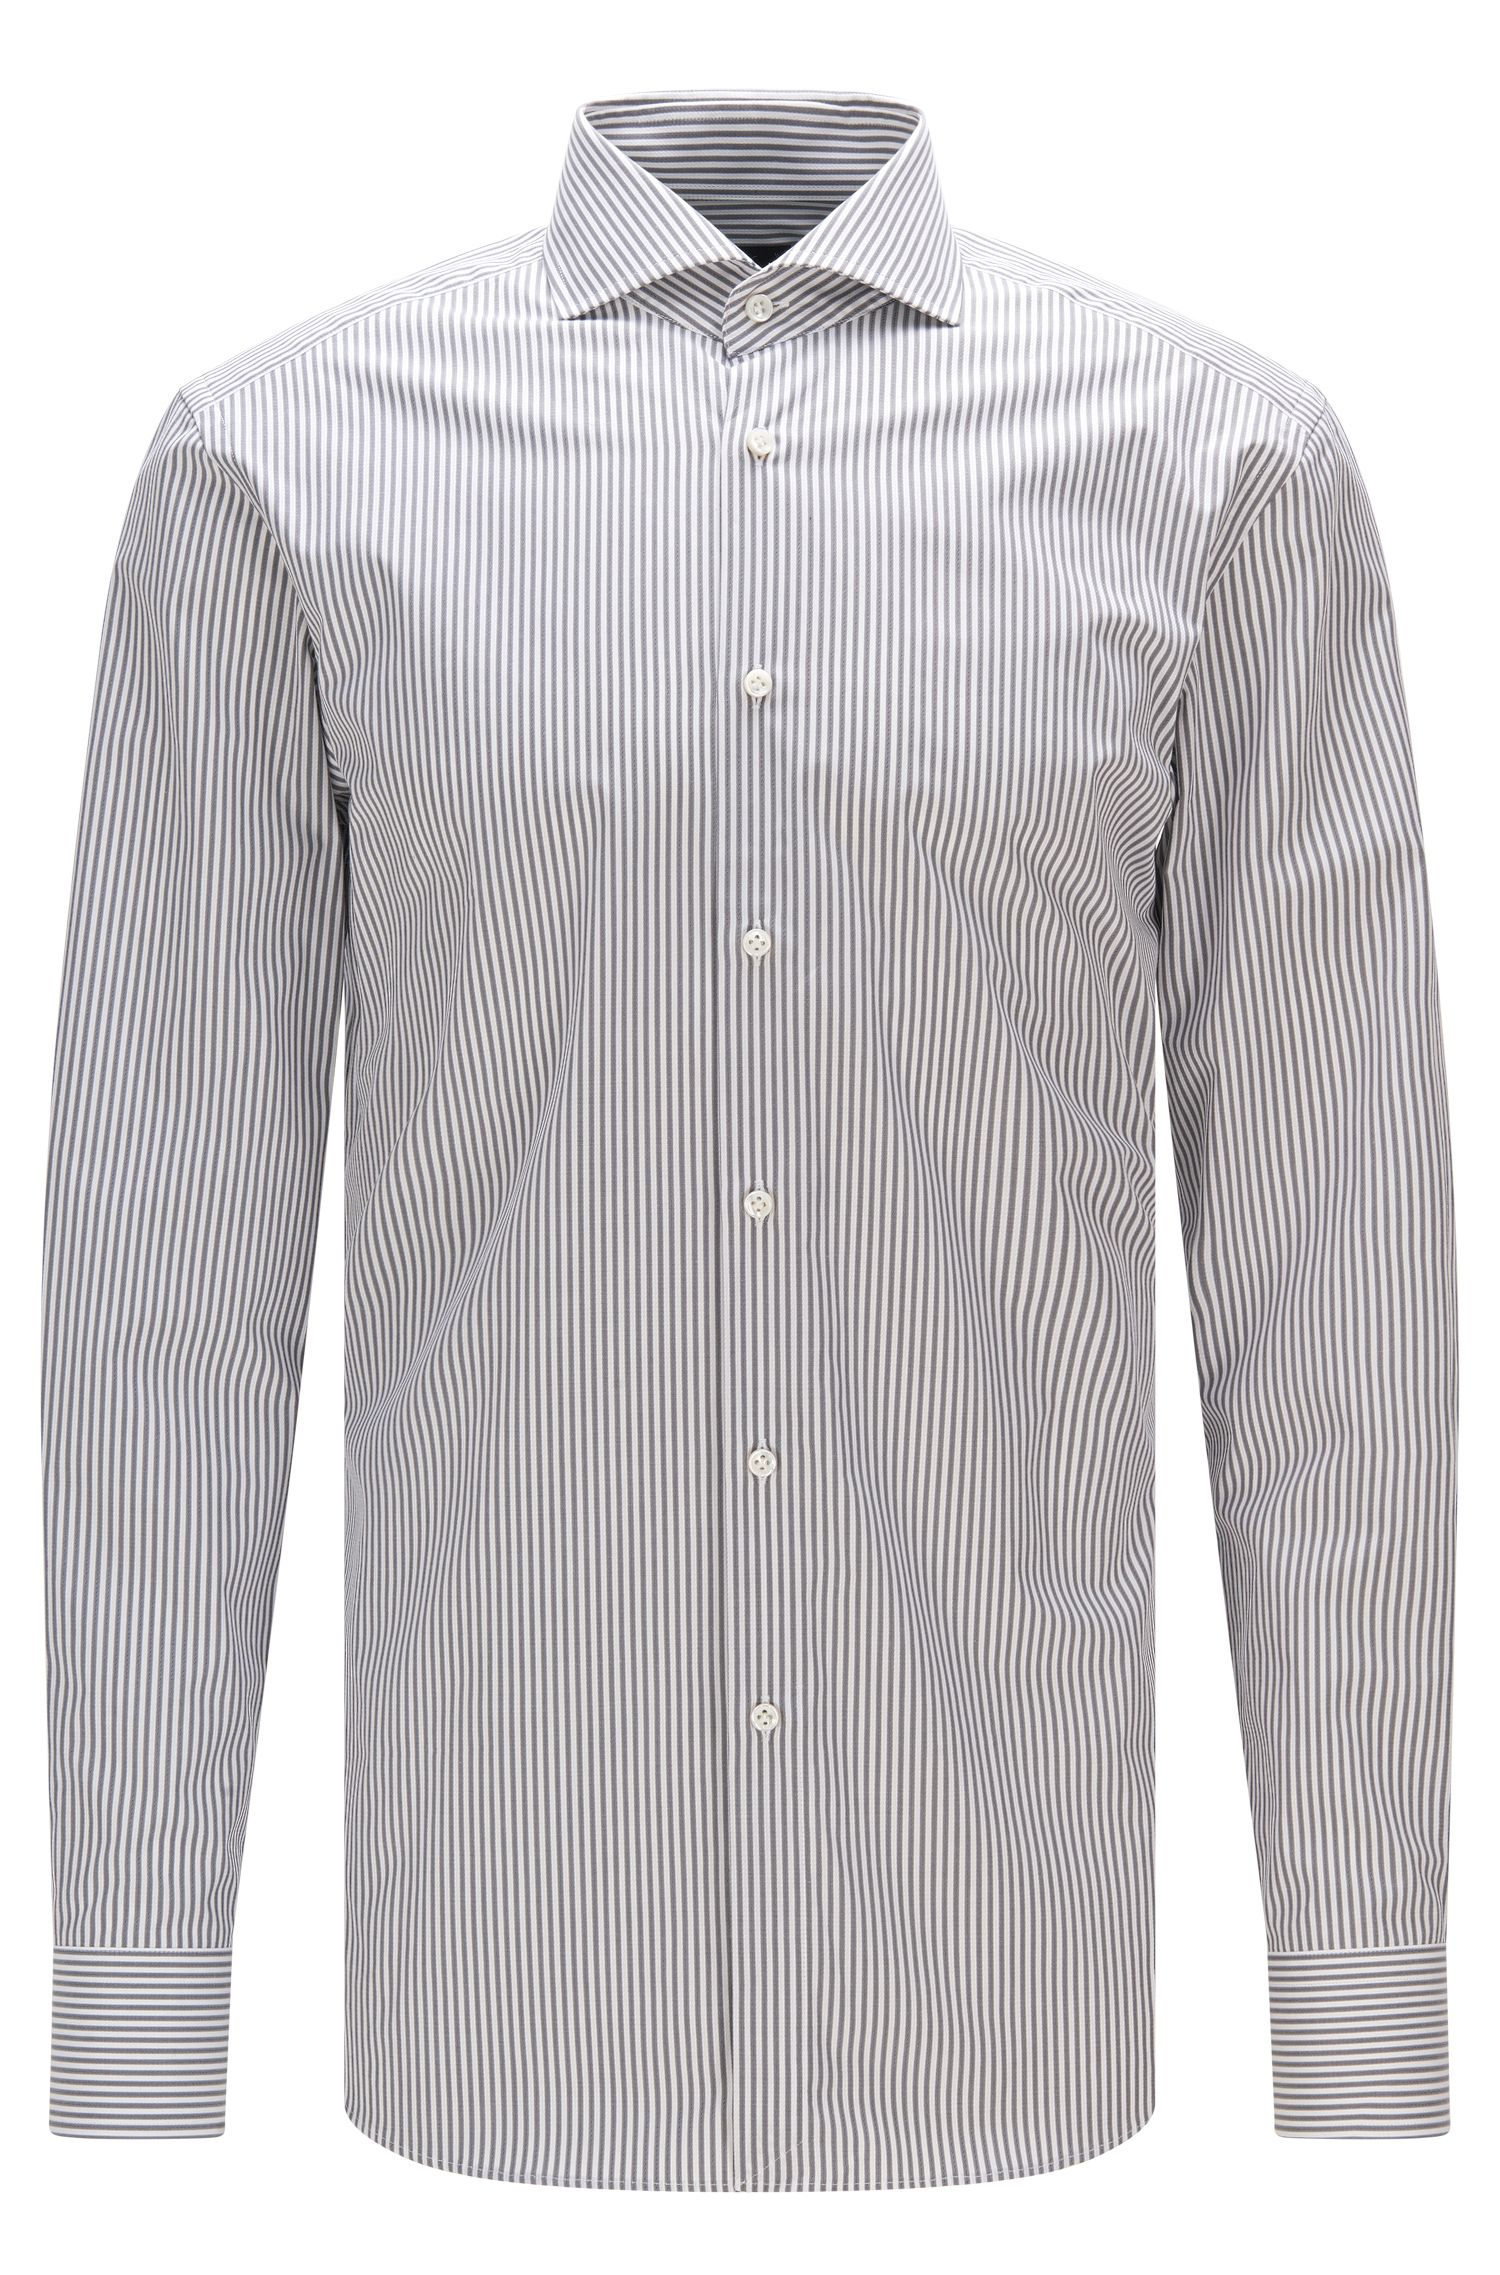 Slim-fit cotton twill shirt with pinstripe pattern